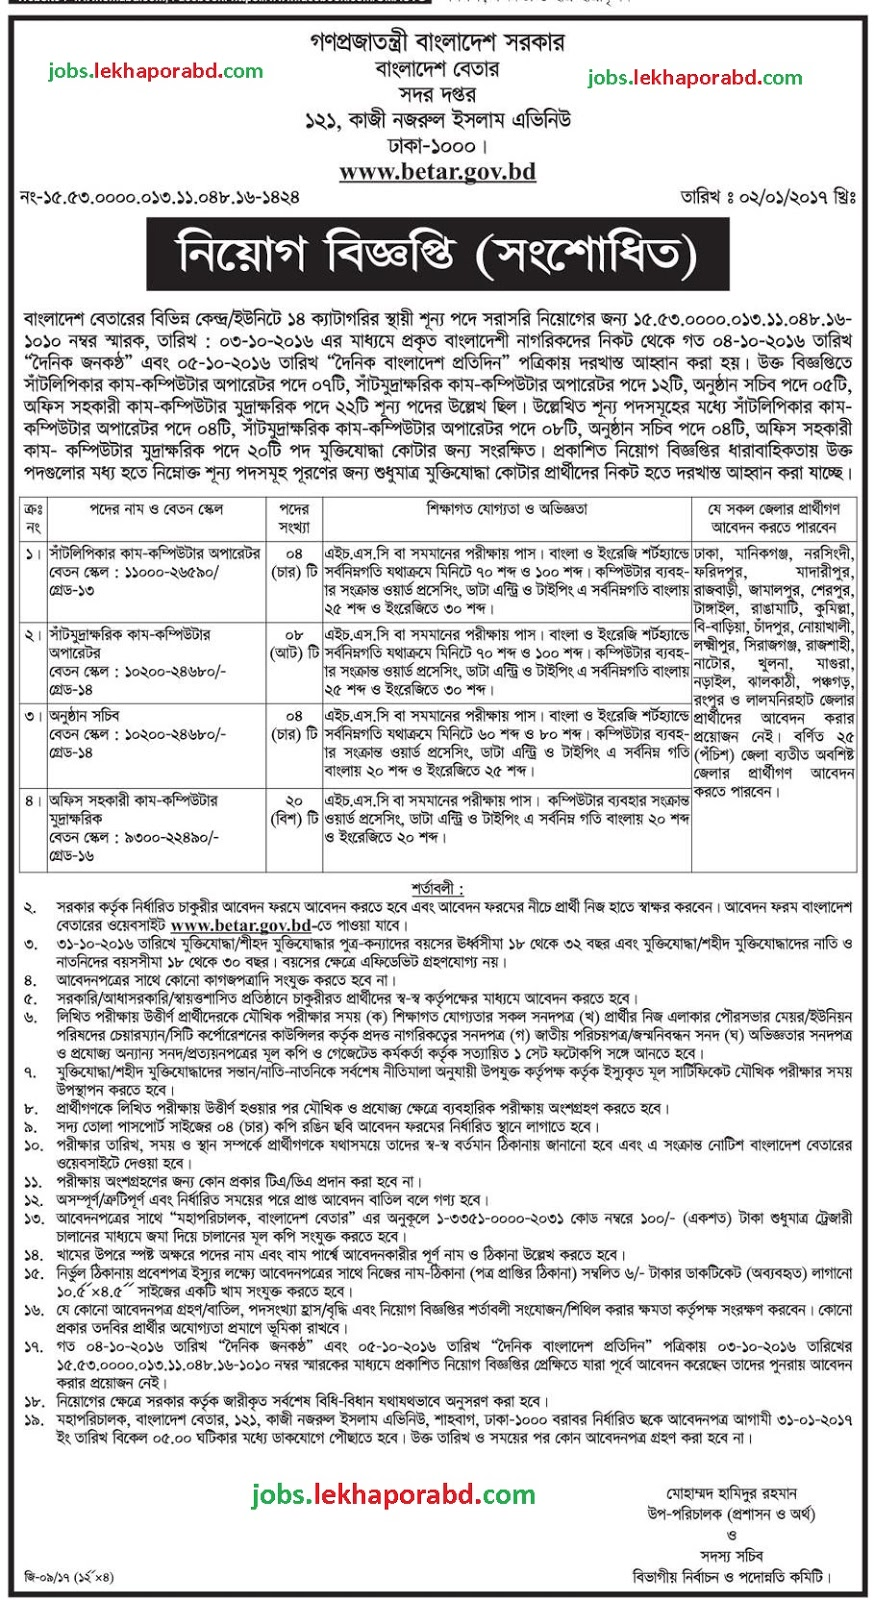 zLdoTkH Job Application Form Of Desh Betar on